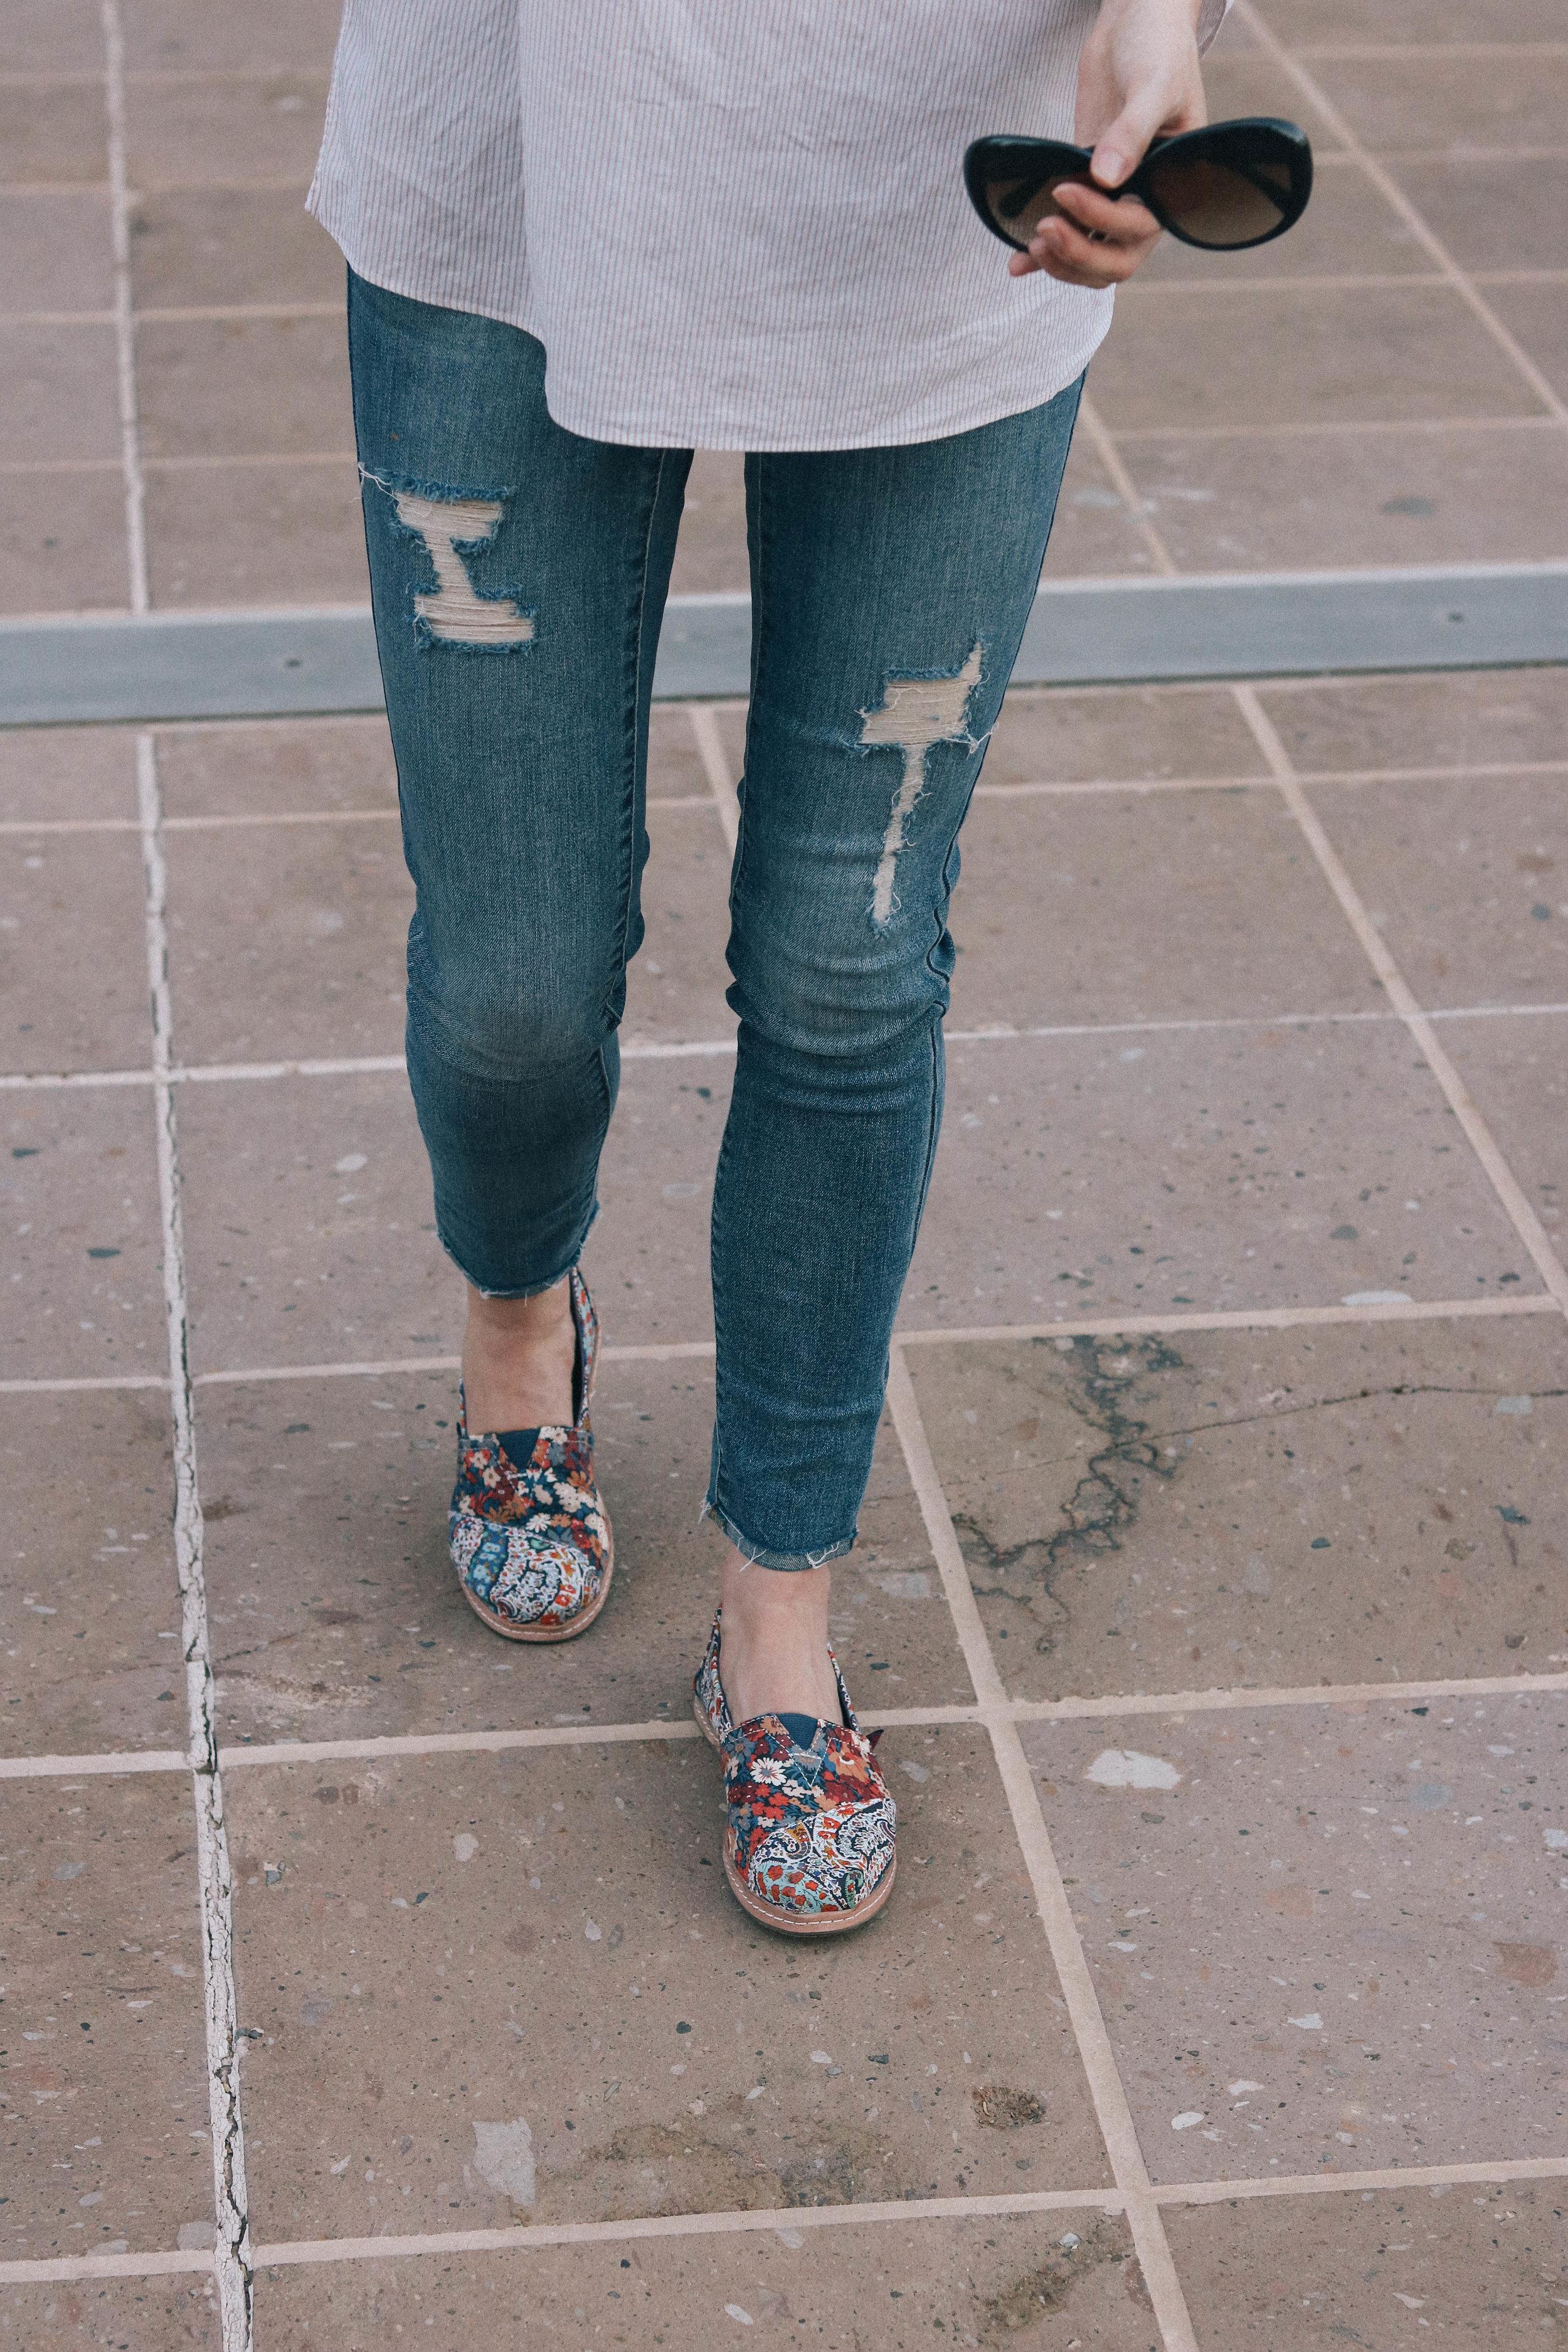 bb-fall-footwear-007 (1 of 1).jpg